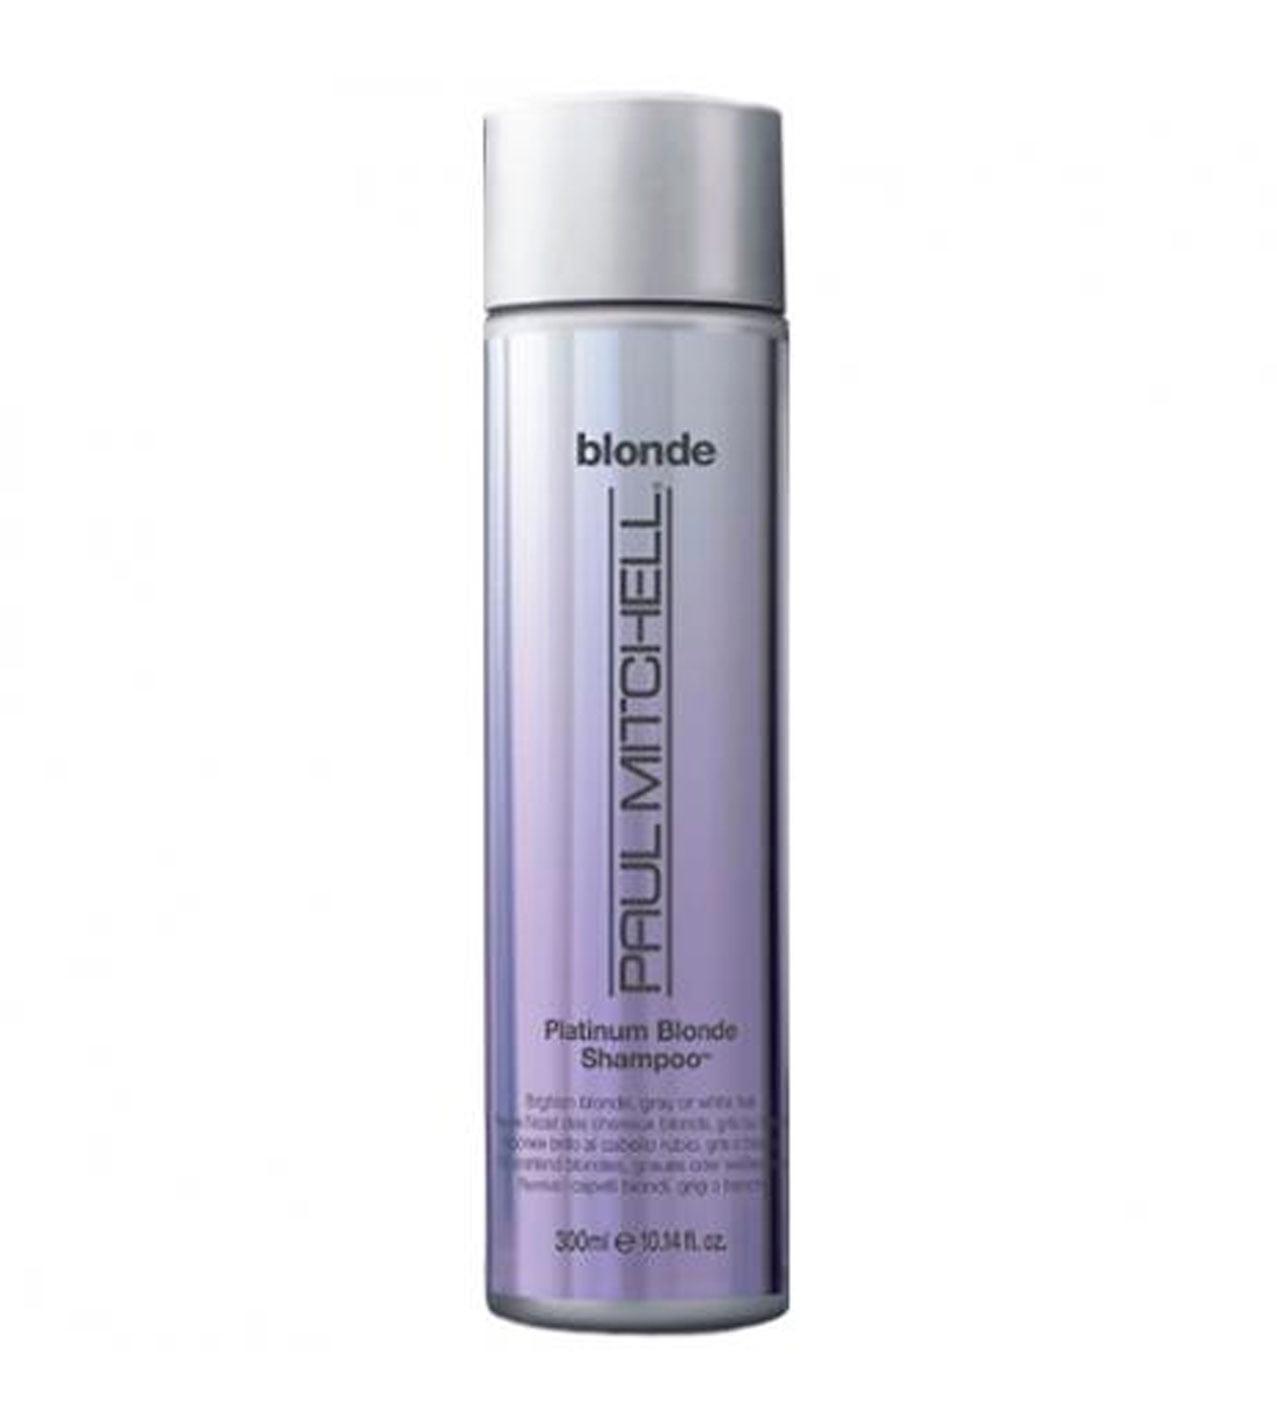 Paul Mitchell Forever Platinum Blonde Shampoo - 300ml